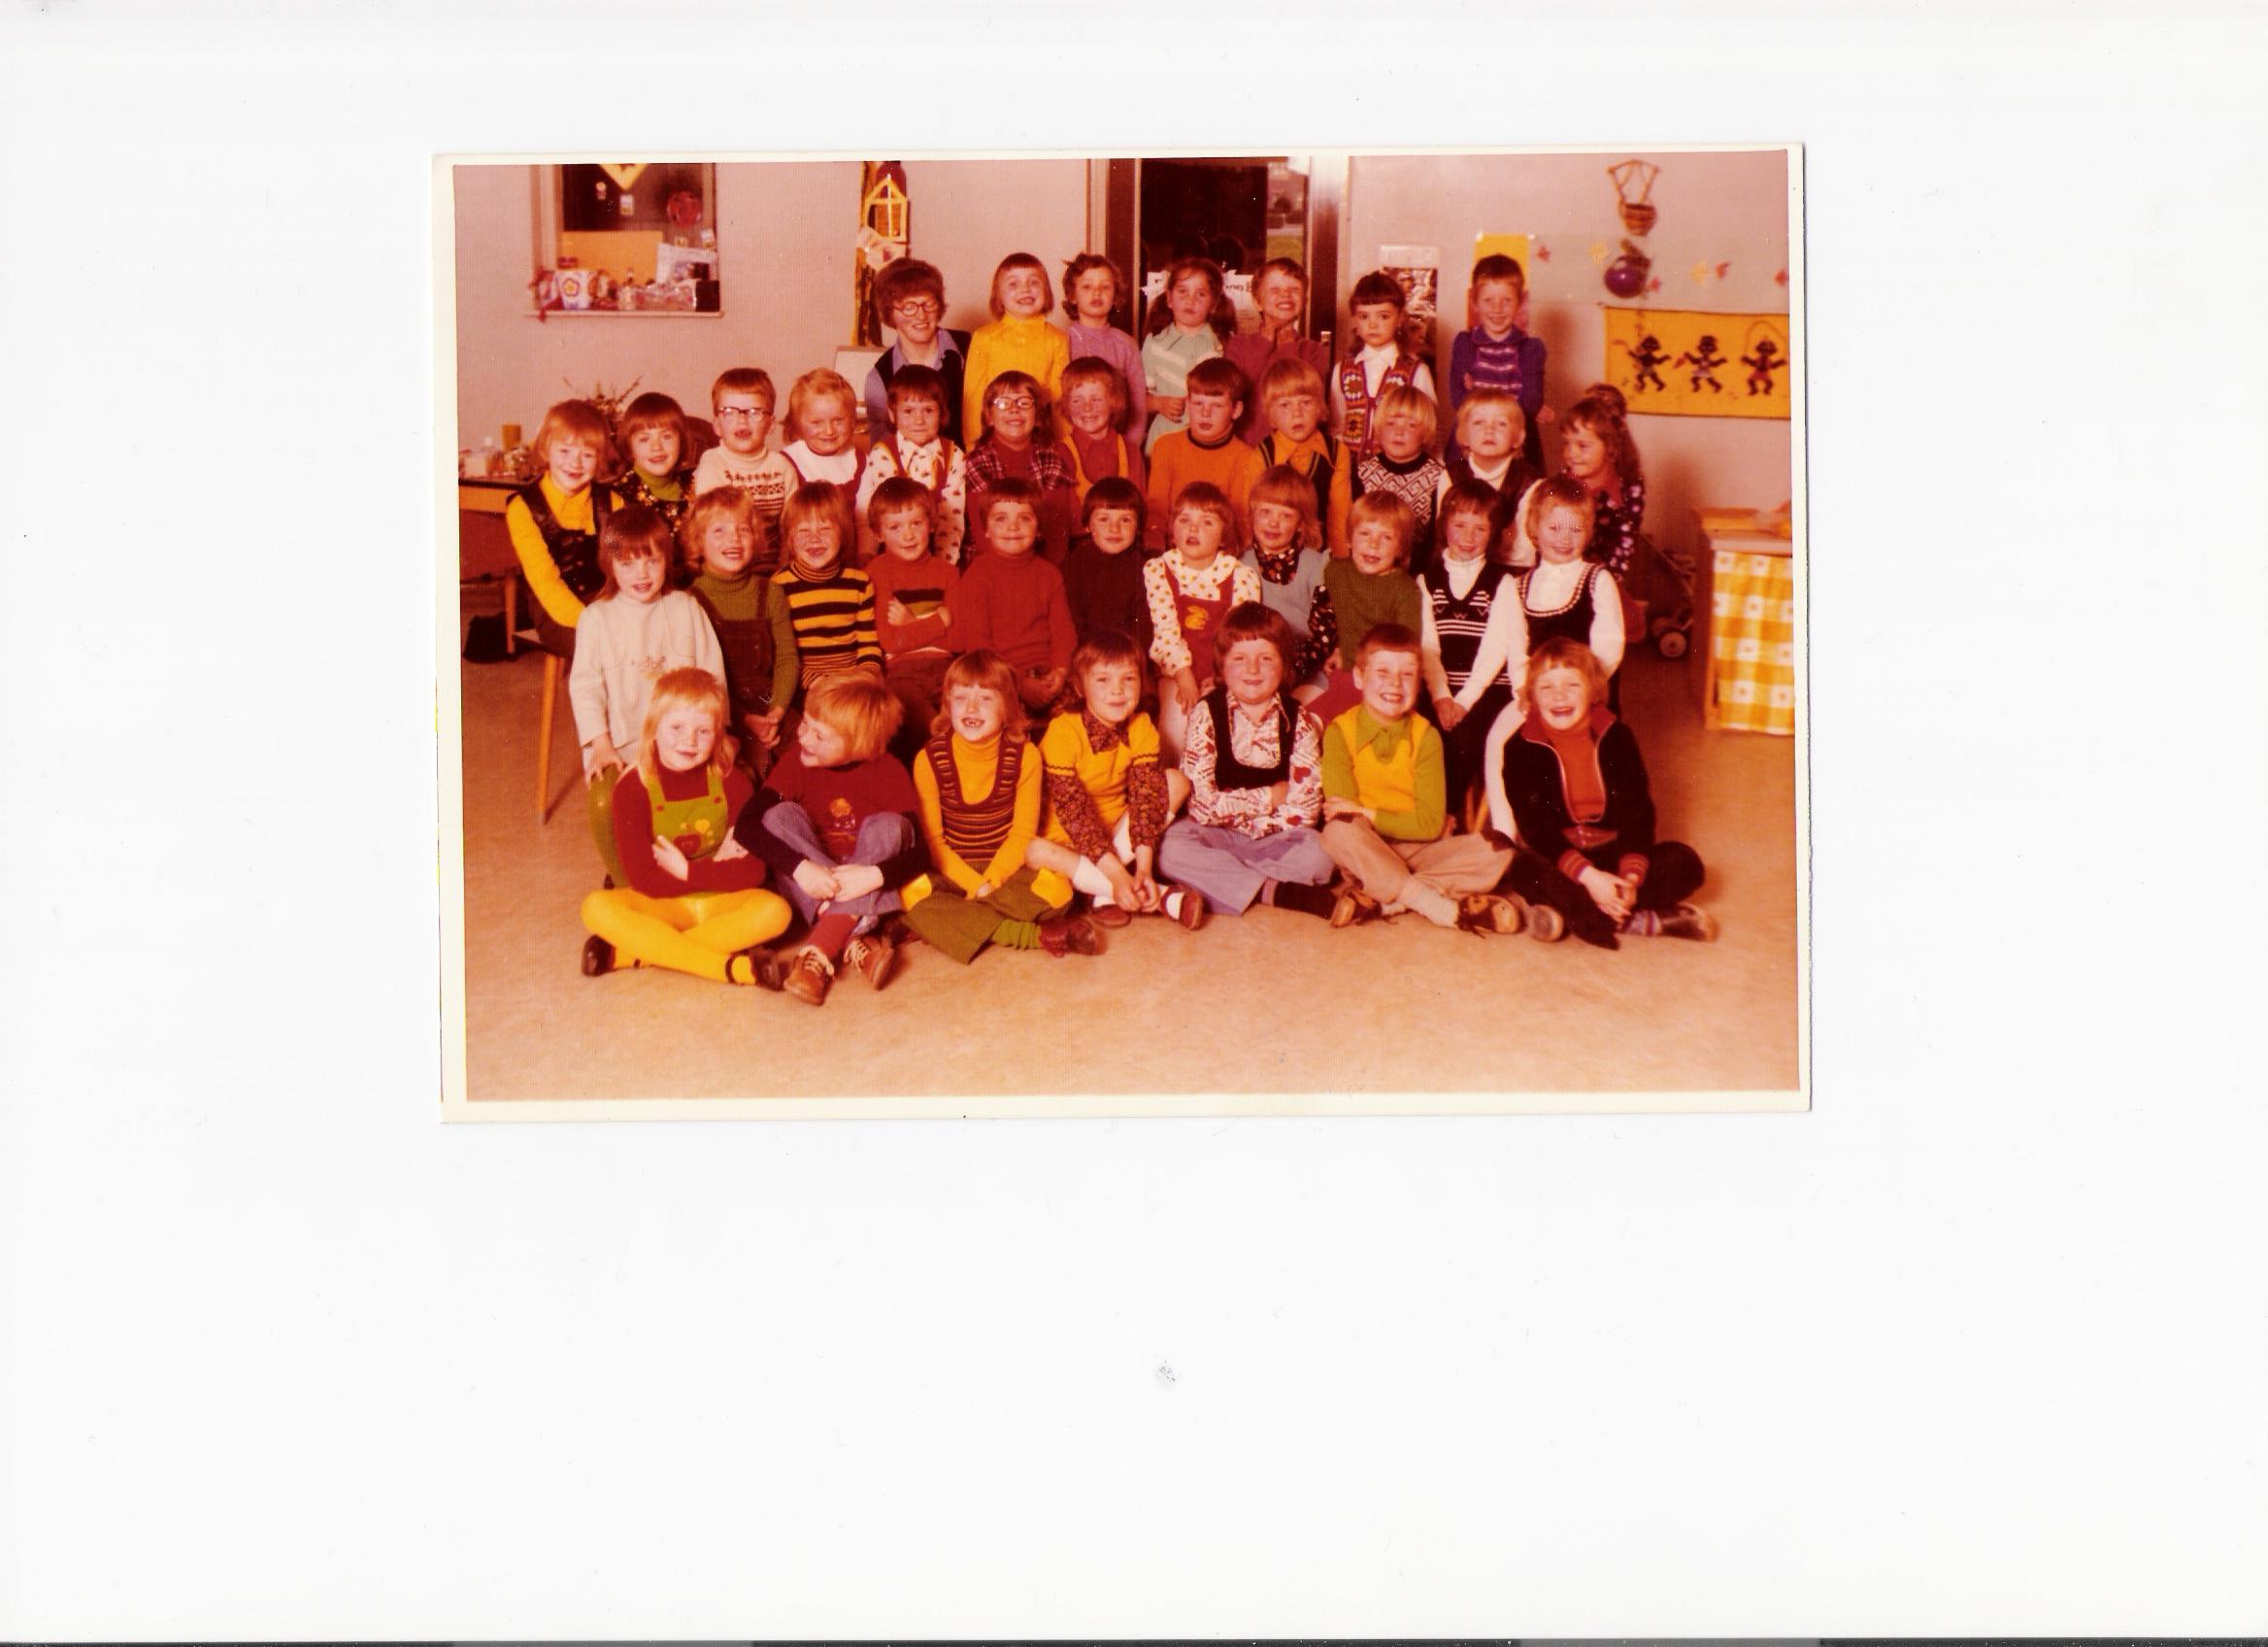 Frits Bode Kleuterschool foto